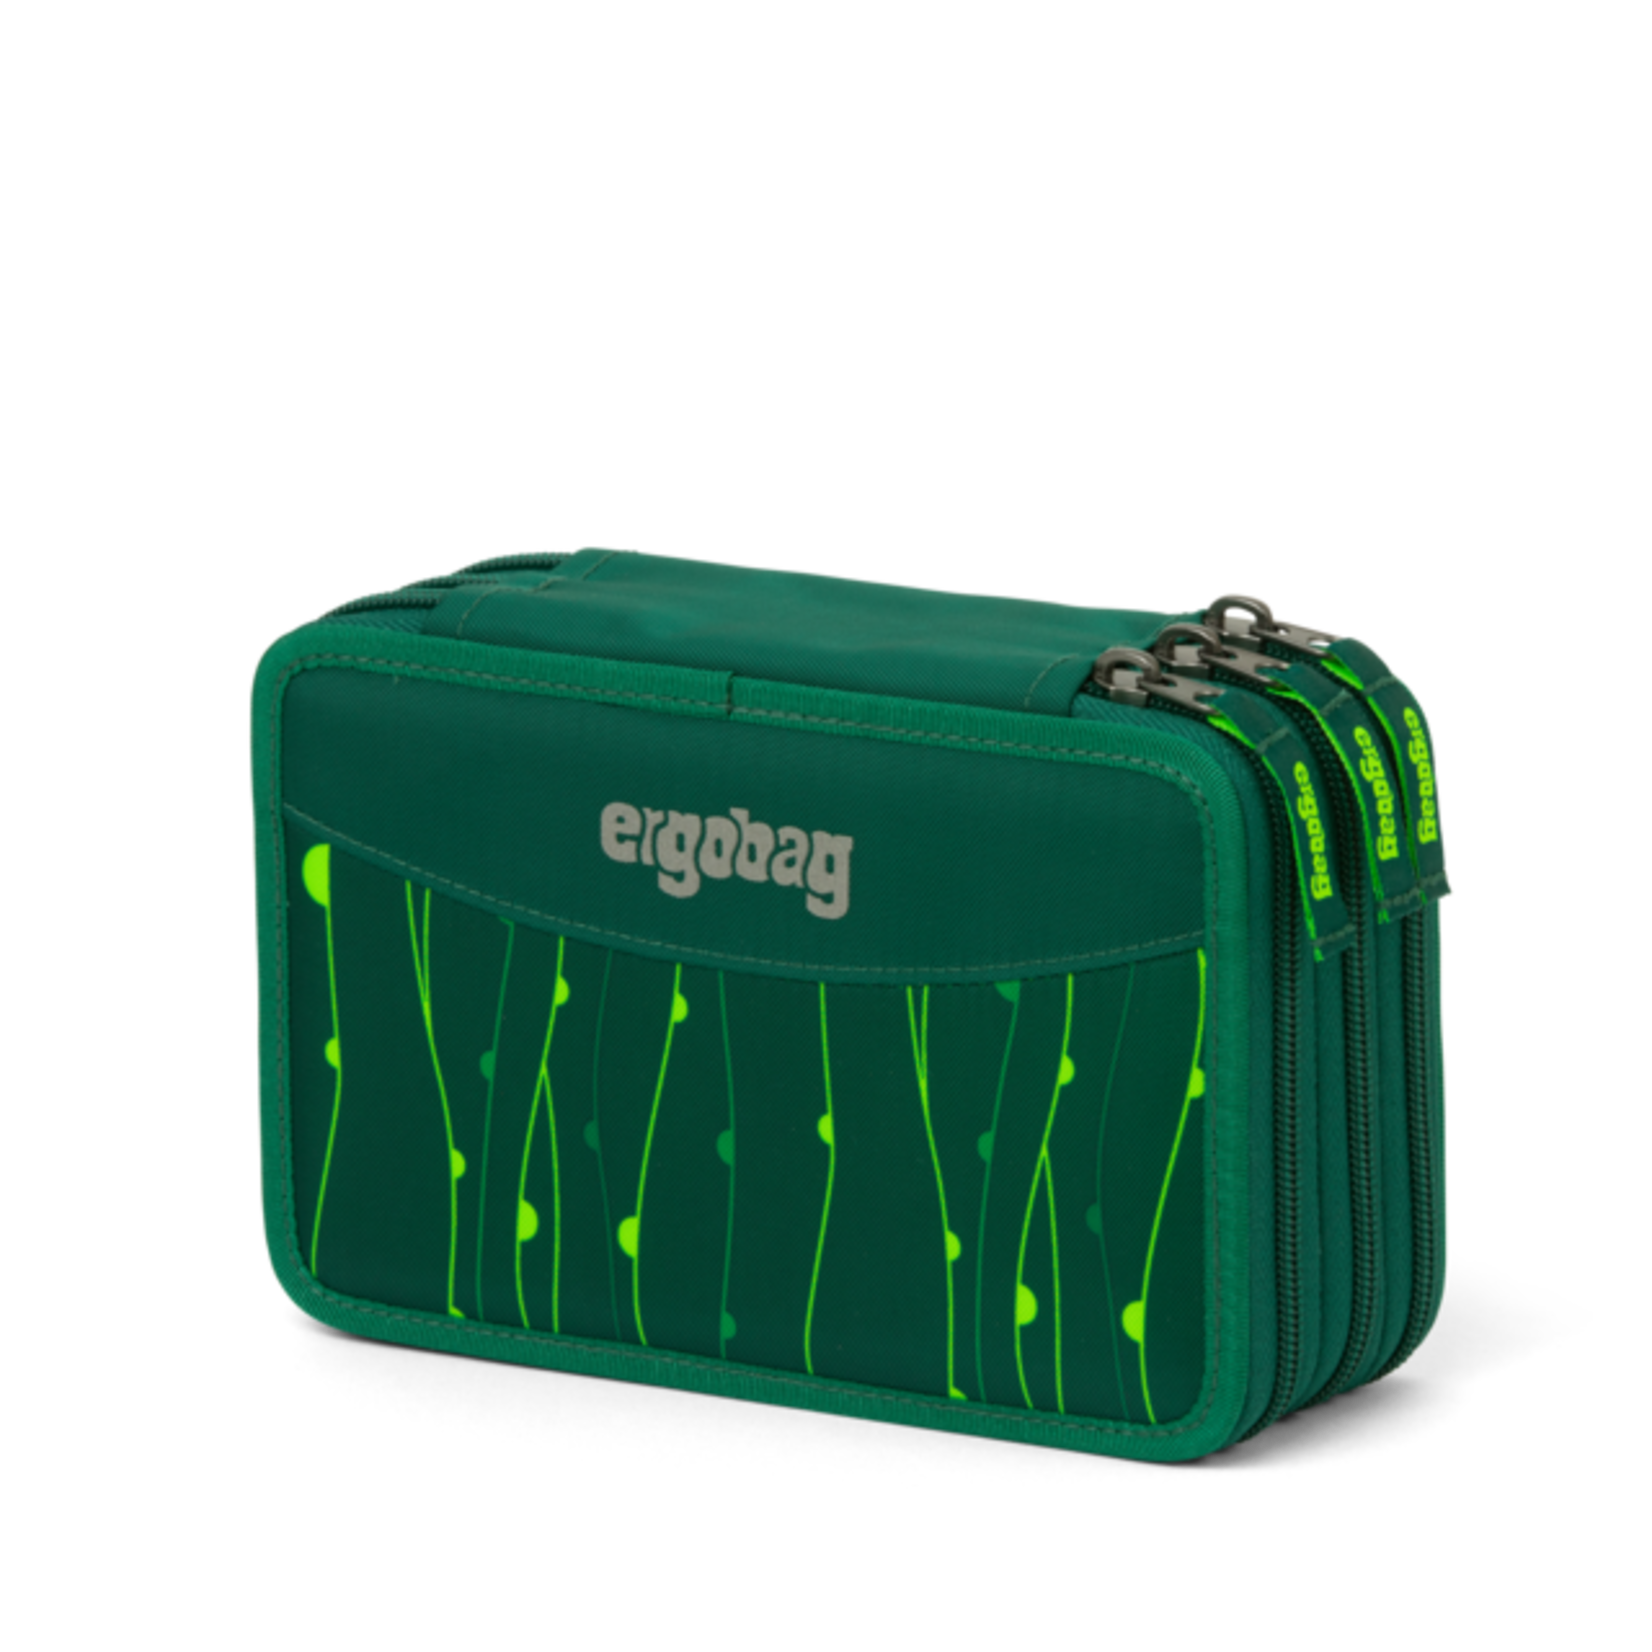 ERGOBAG Maxi-Mäppchen